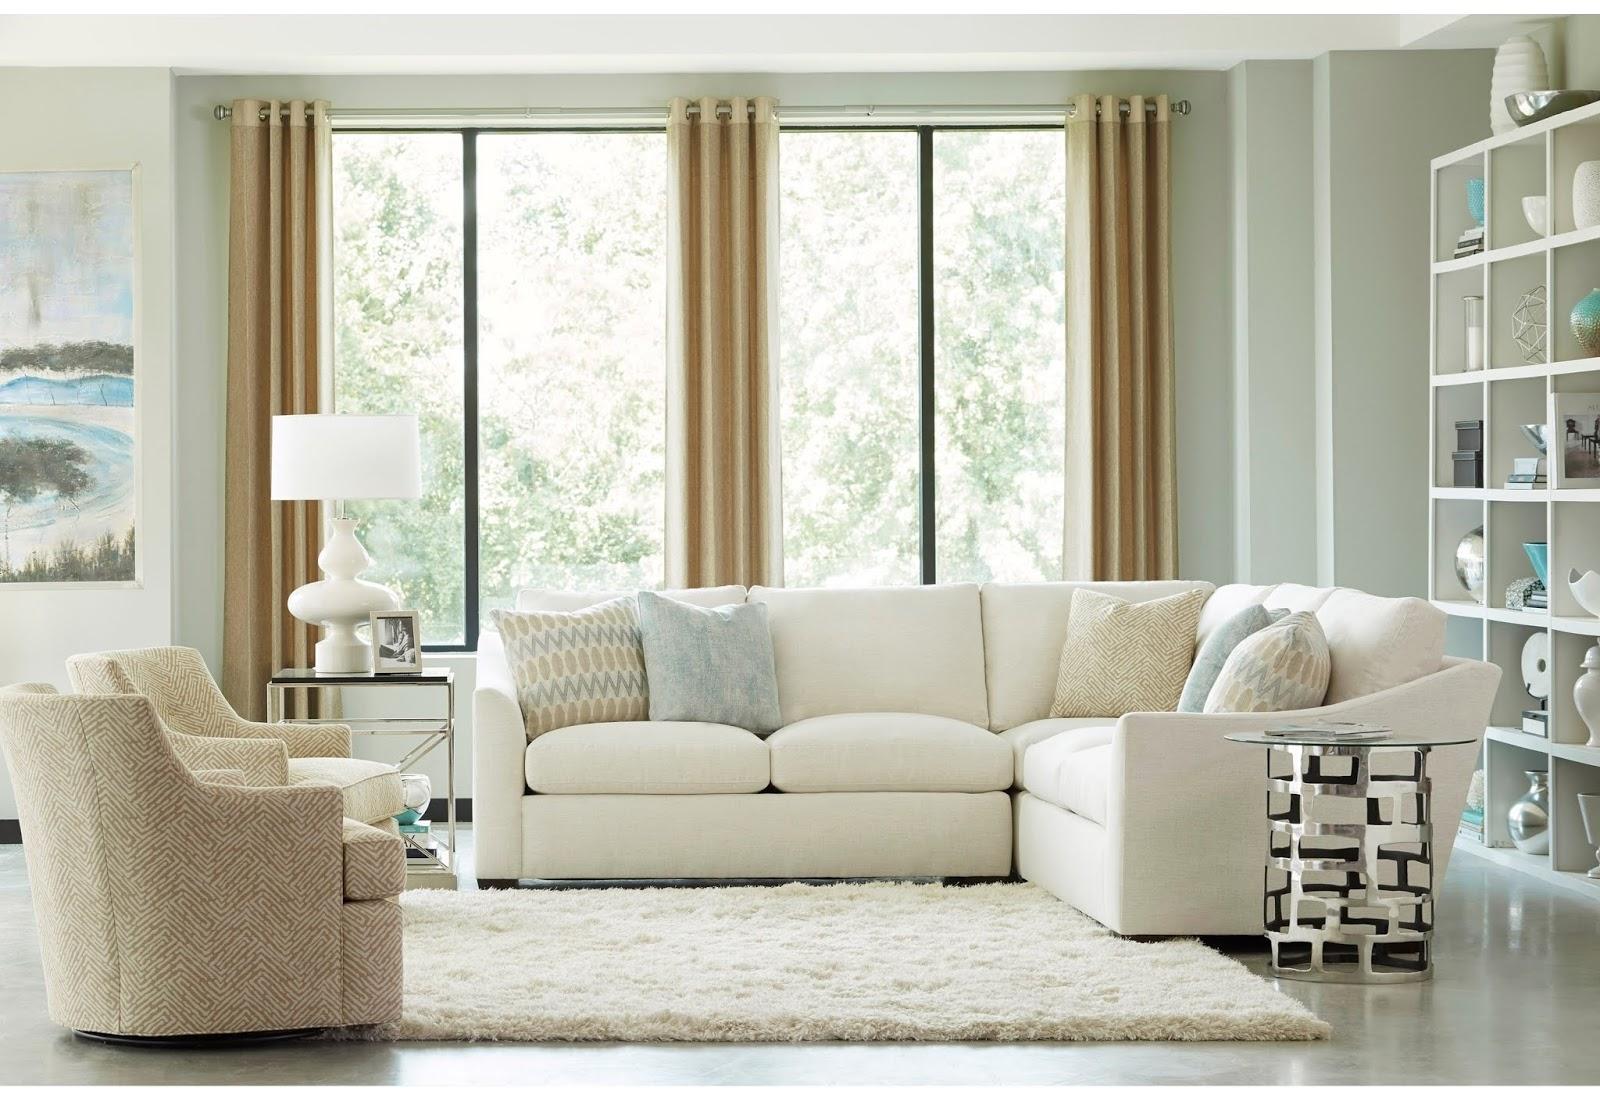 Baer 39 s custom furniture best interior design web based for Interior design web app